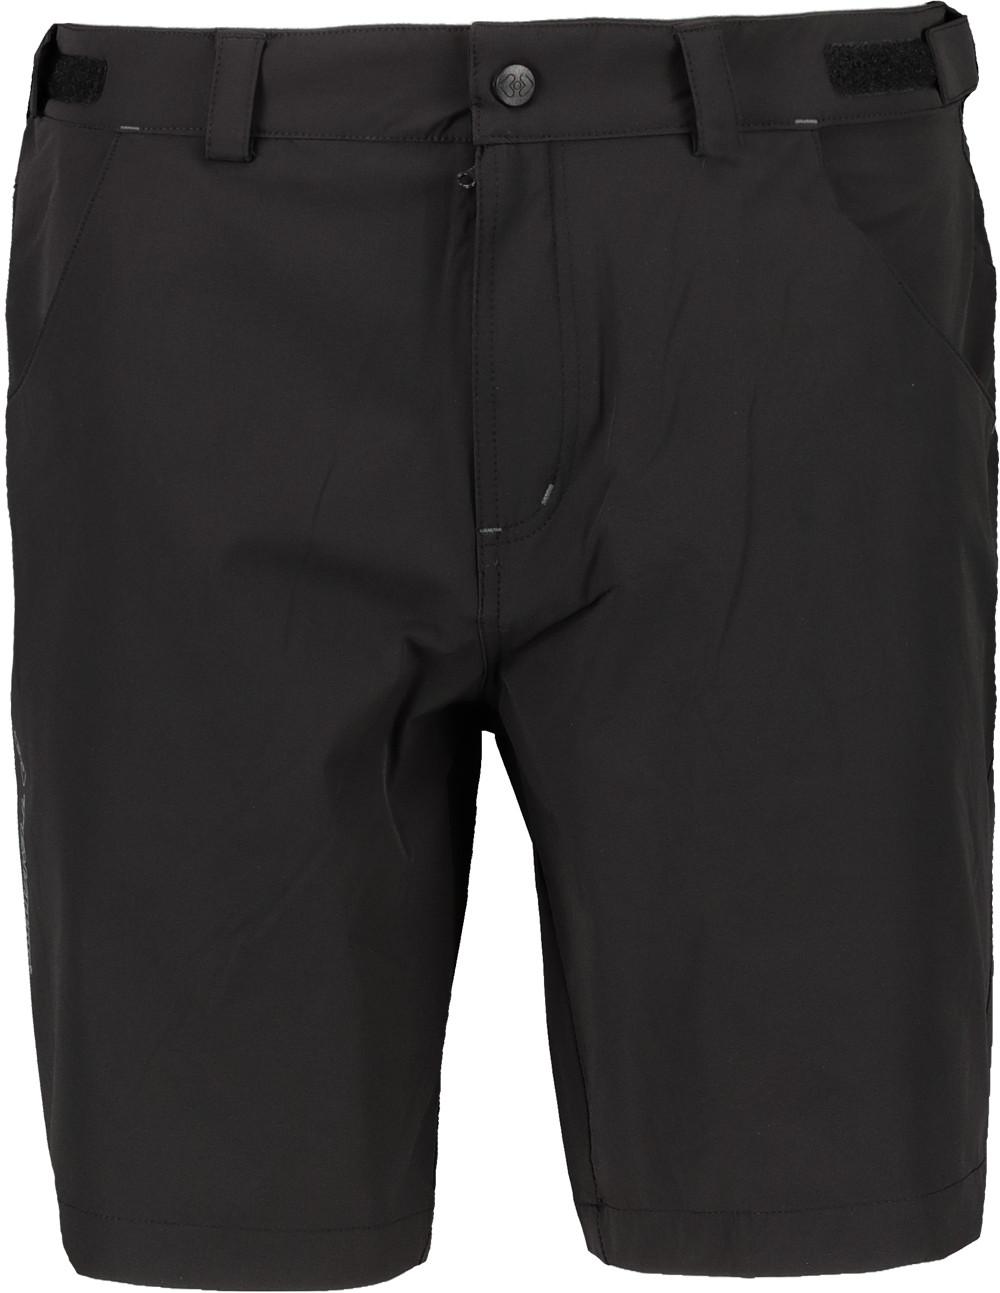 Men's shorts Uni TRIMM HAWAI